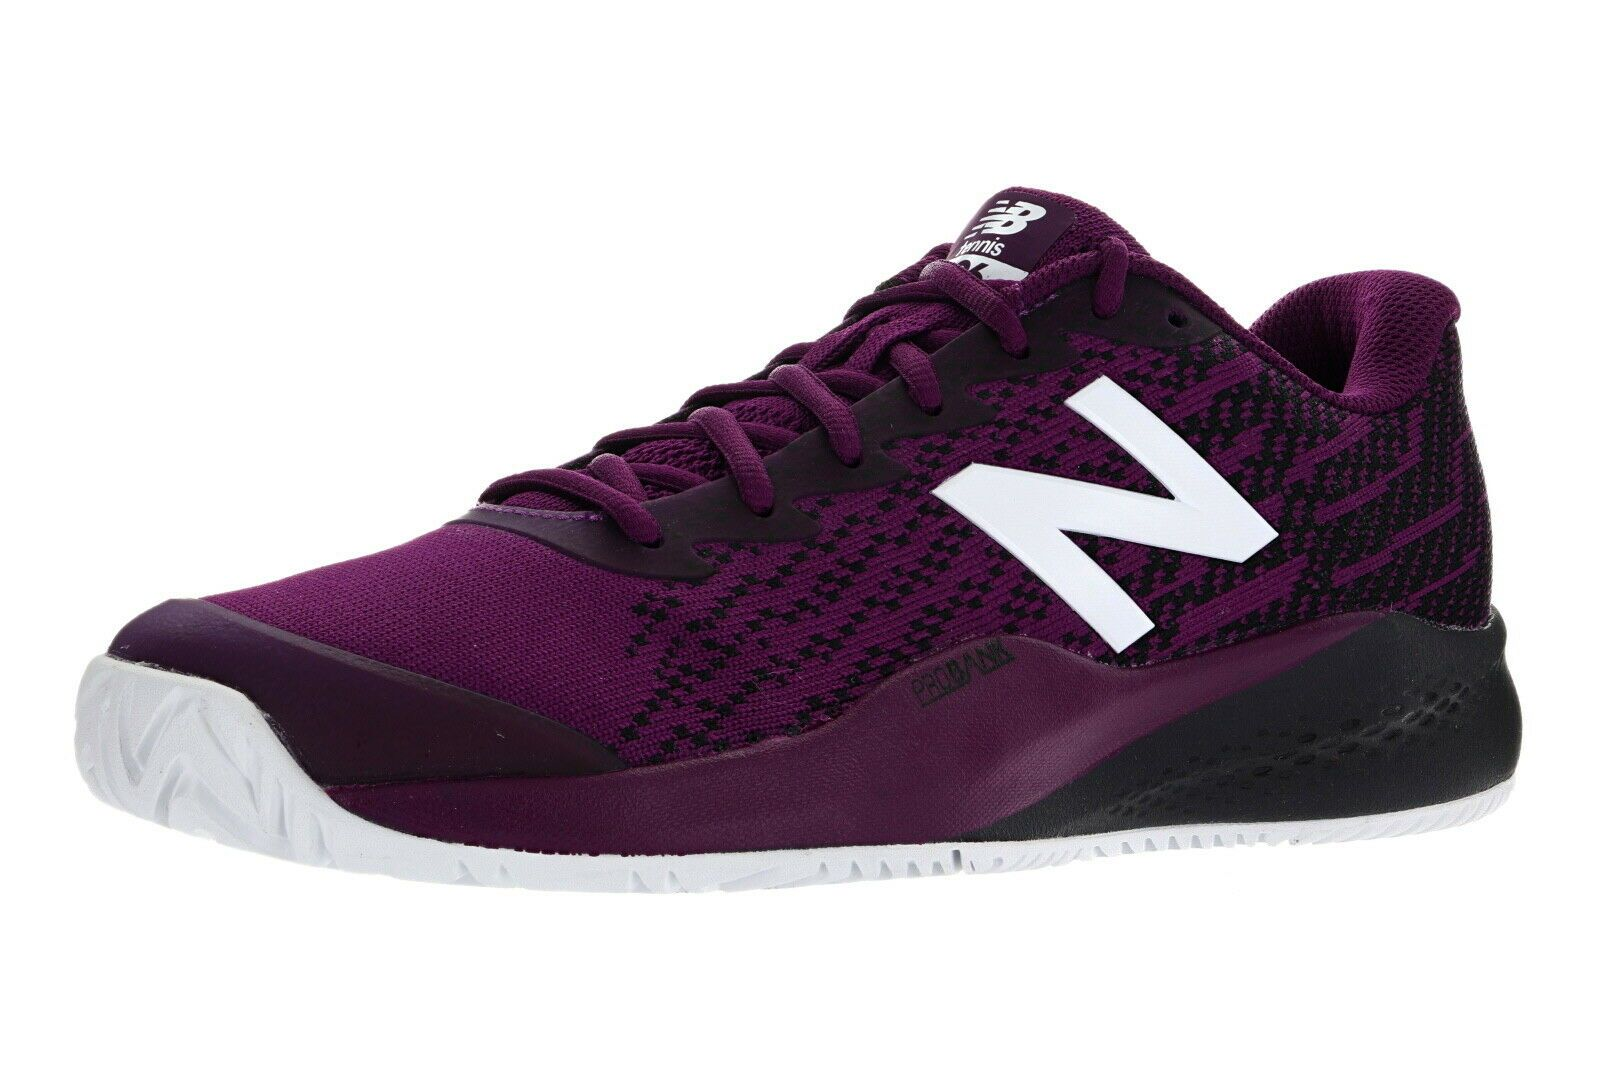 New Balance 996v3 Men S Hard Court Tennis Shoes Medium Width Mch996a3 In 2020 New Balance Tennis Shoes New Balance Shoes